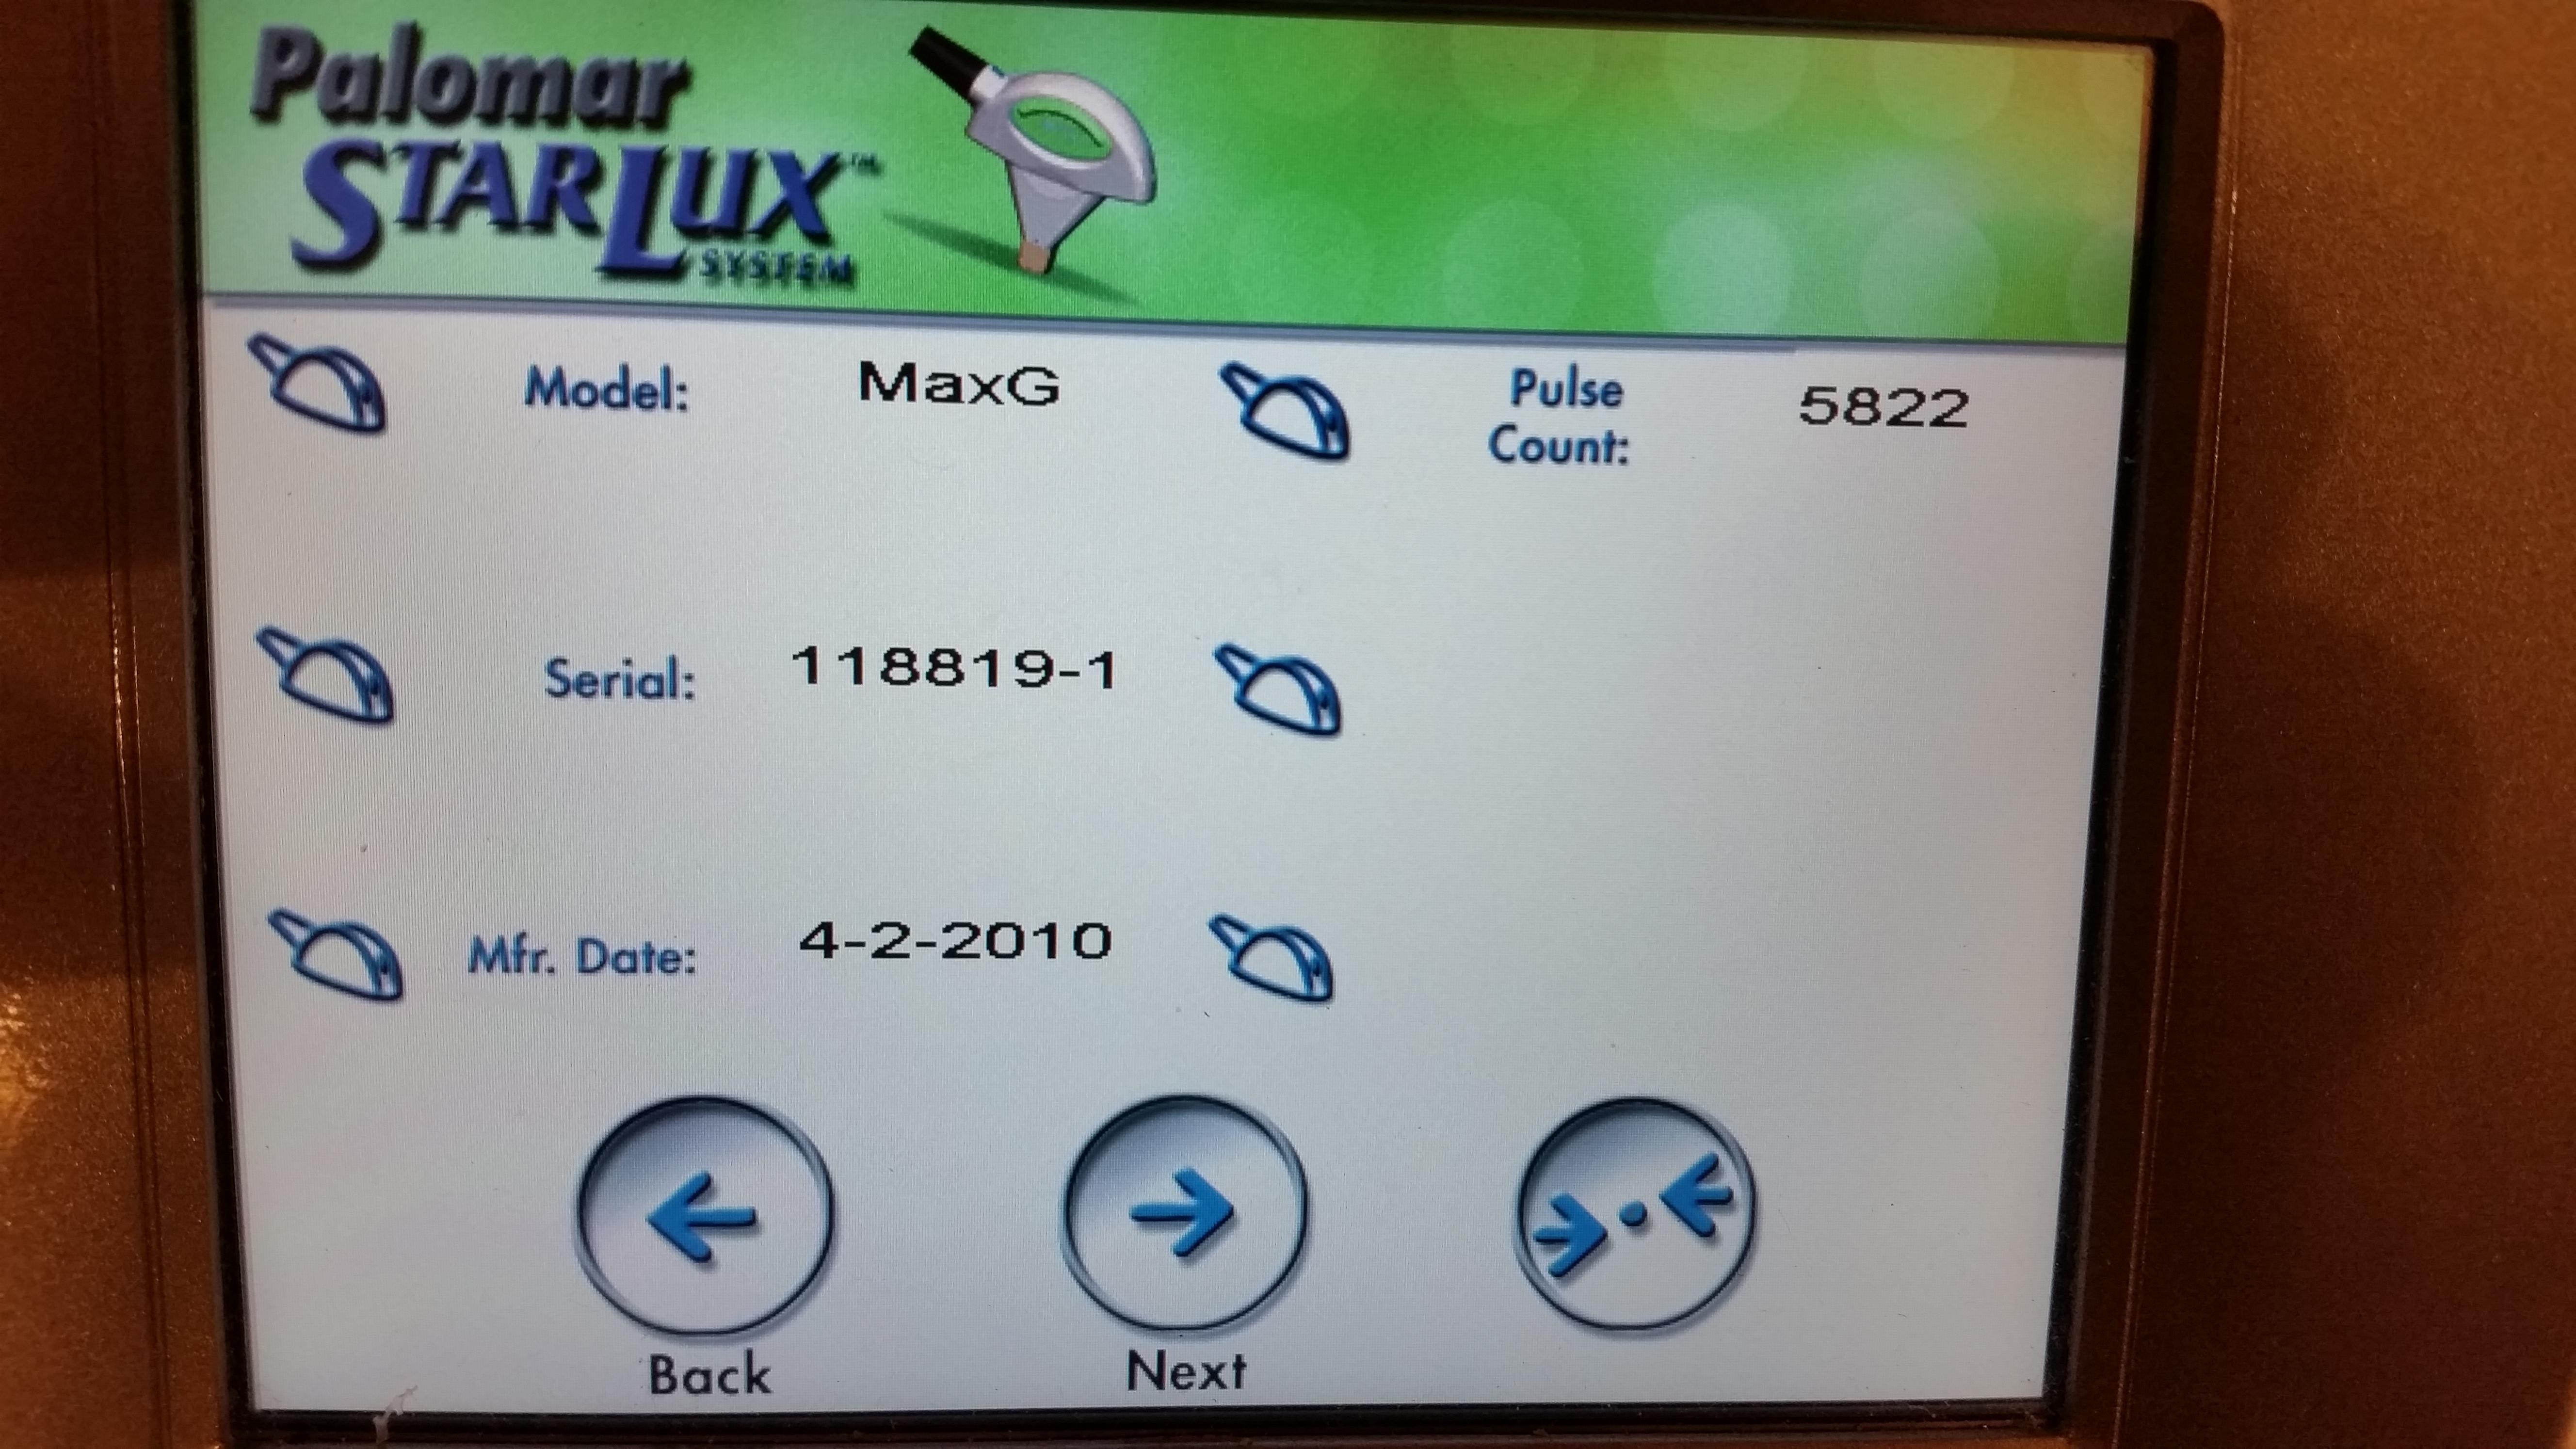 Palomar StarLux MaxG Handpiece (2)